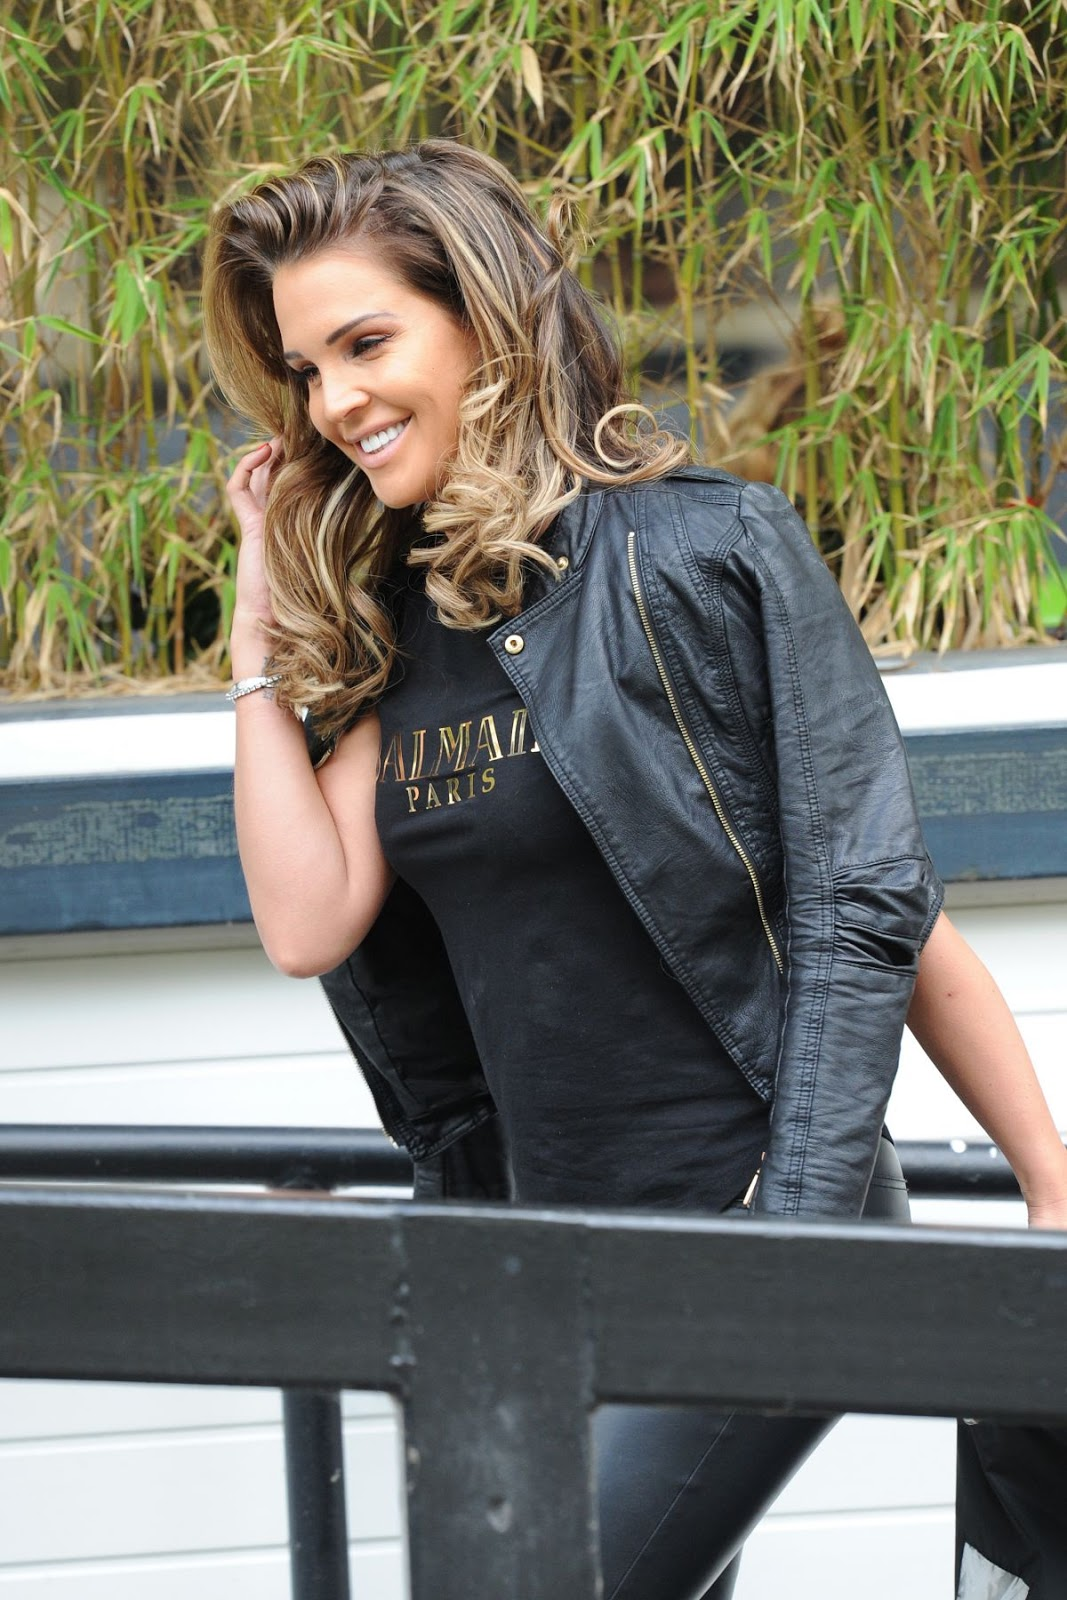 HD Photos of Ex Miss England Danielle Lloyd At Itv Studios In London